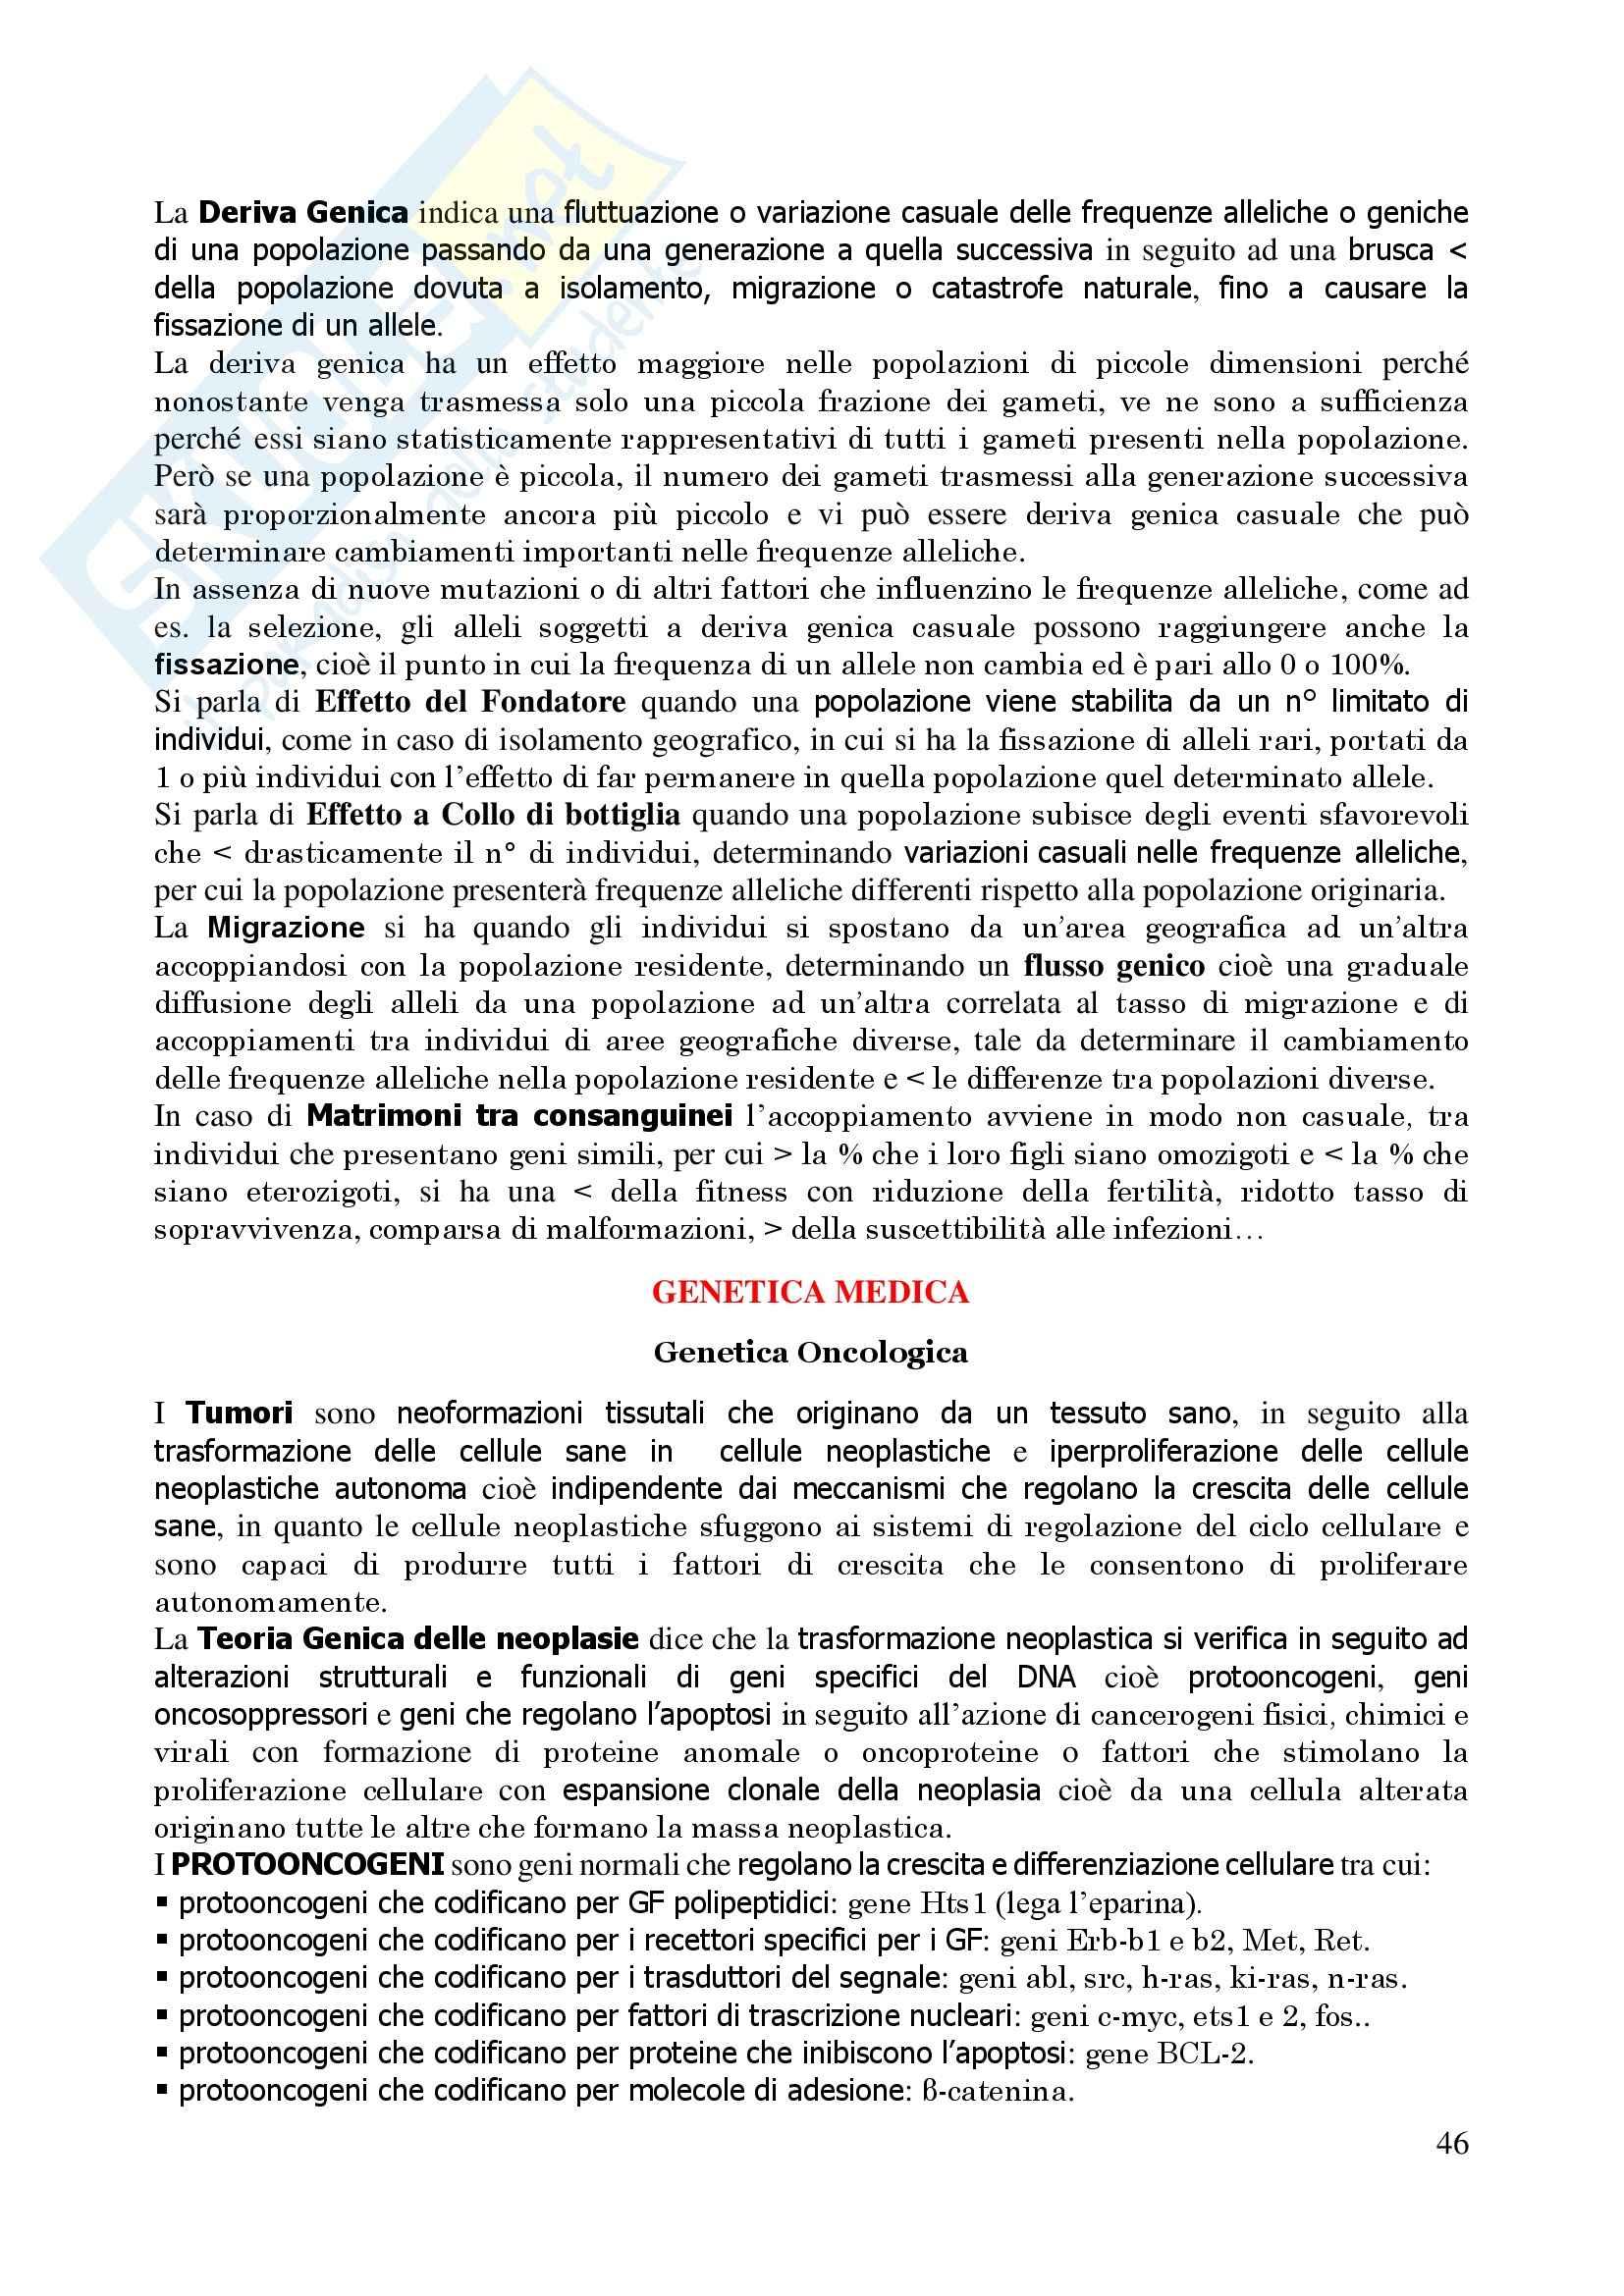 Genetica Umana - Appunti Pag. 46